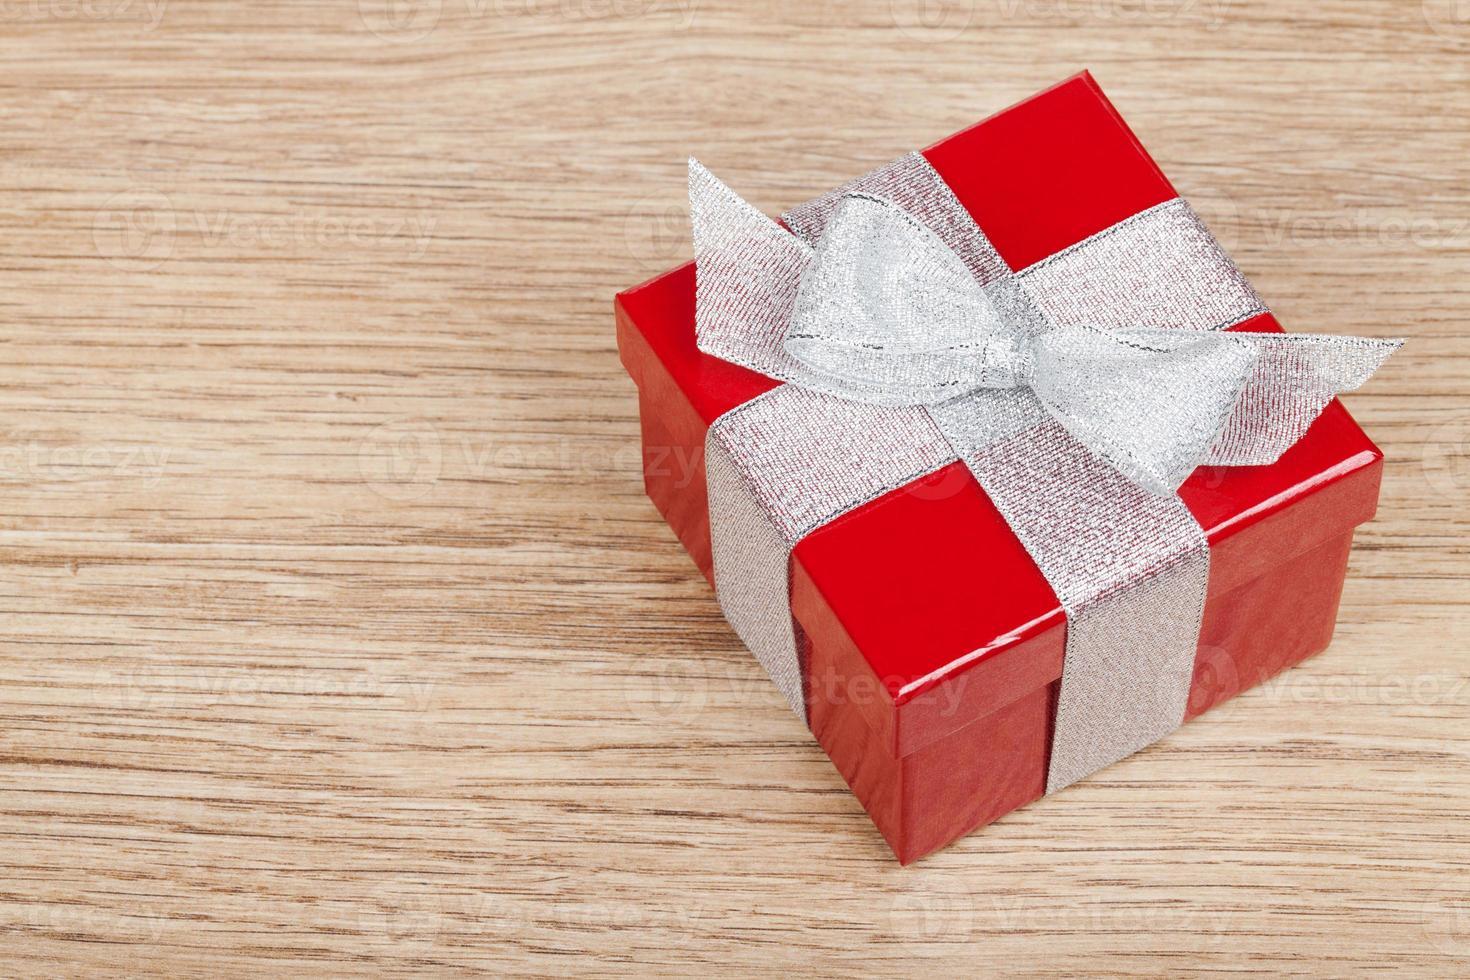 caja de regalo roja foto